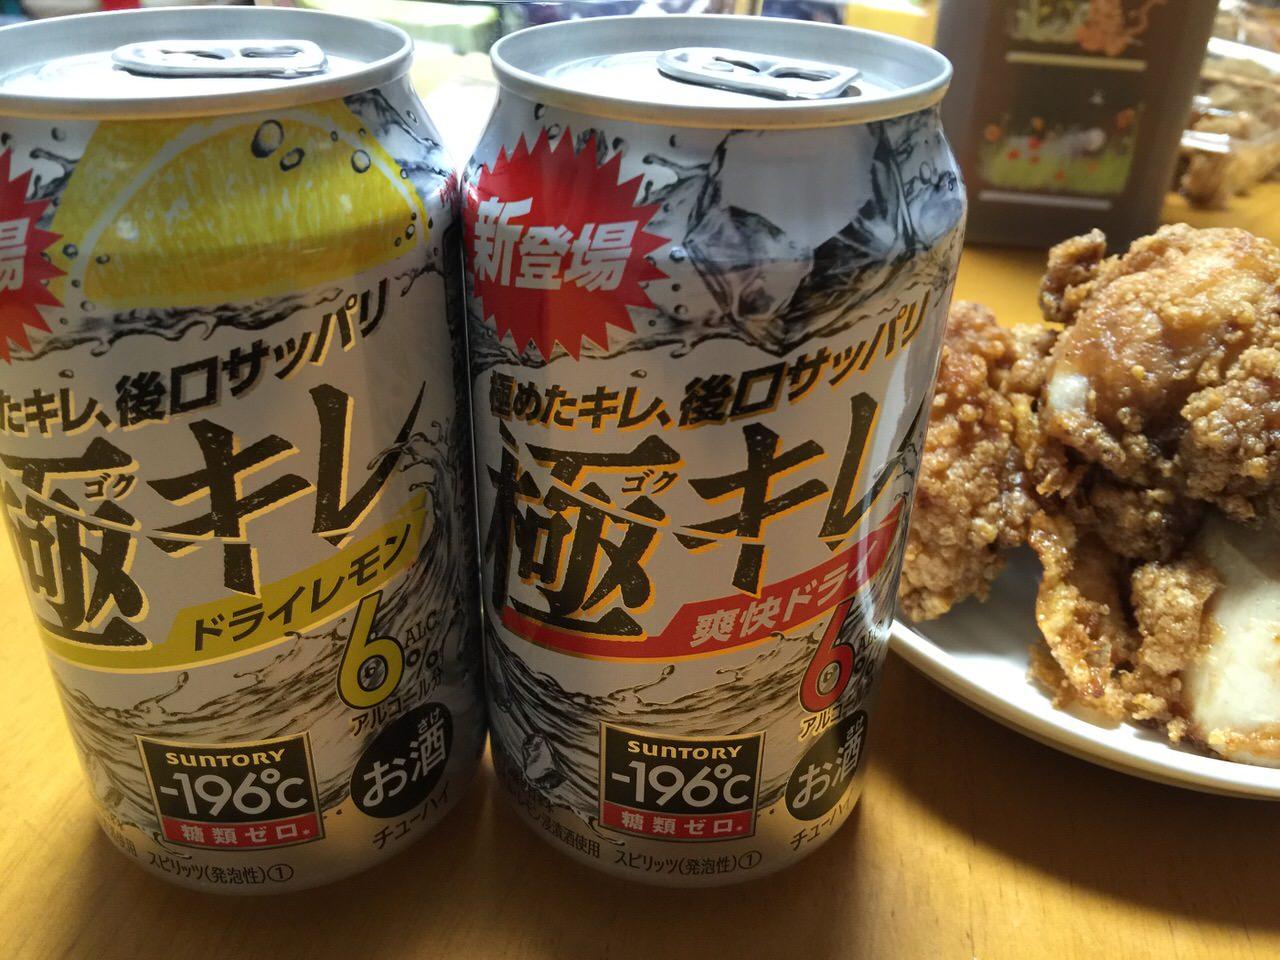 Suntory gokukire 2714